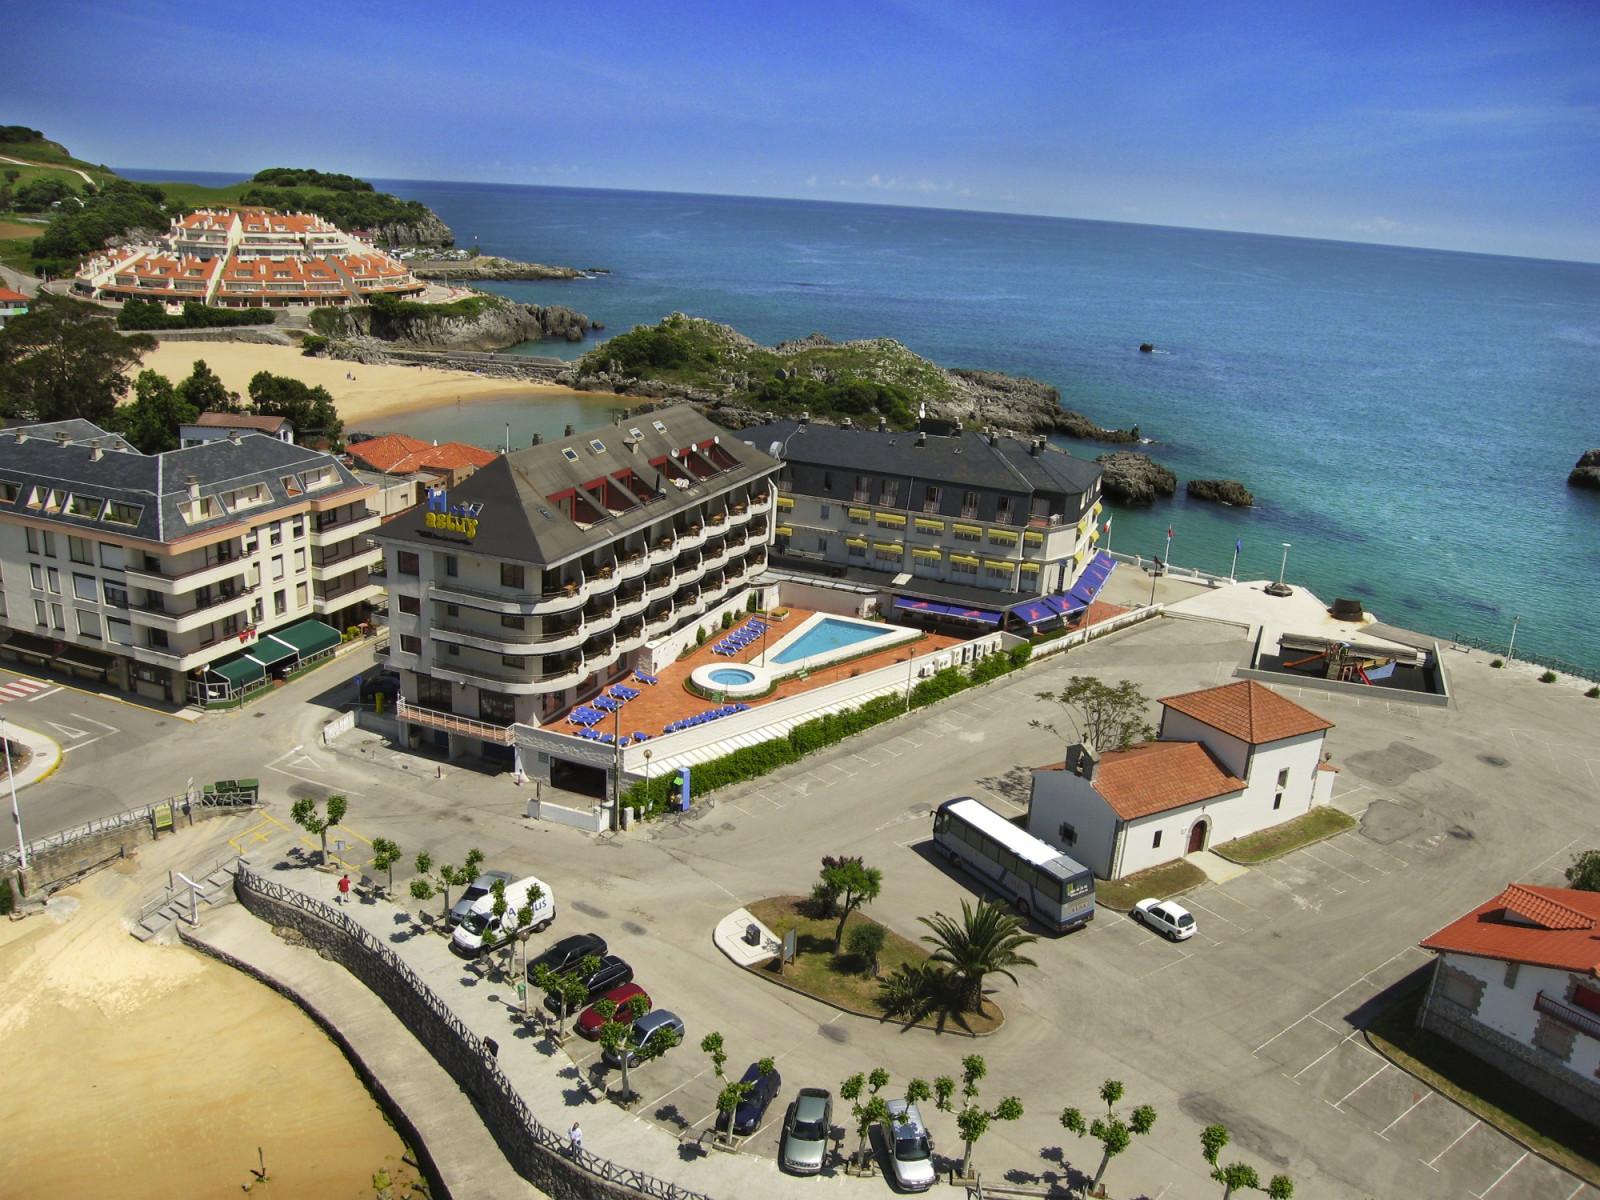 hotel olimpo santander: